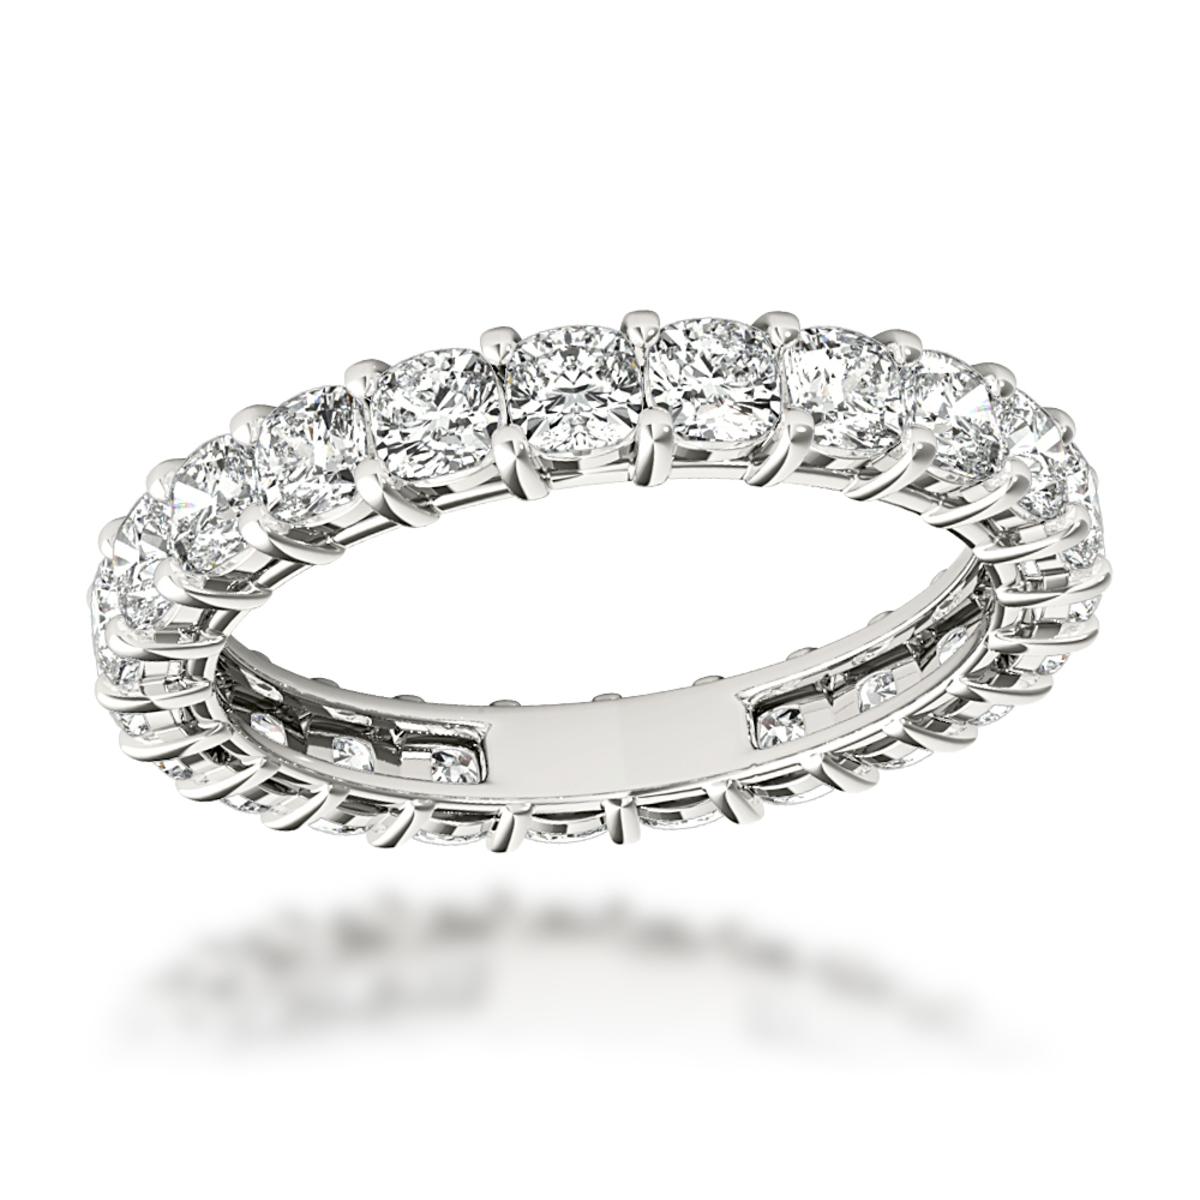 Platinum Cushion Cut Diamond Eternity Ring Diamond Anniversary Ring 2.5ct